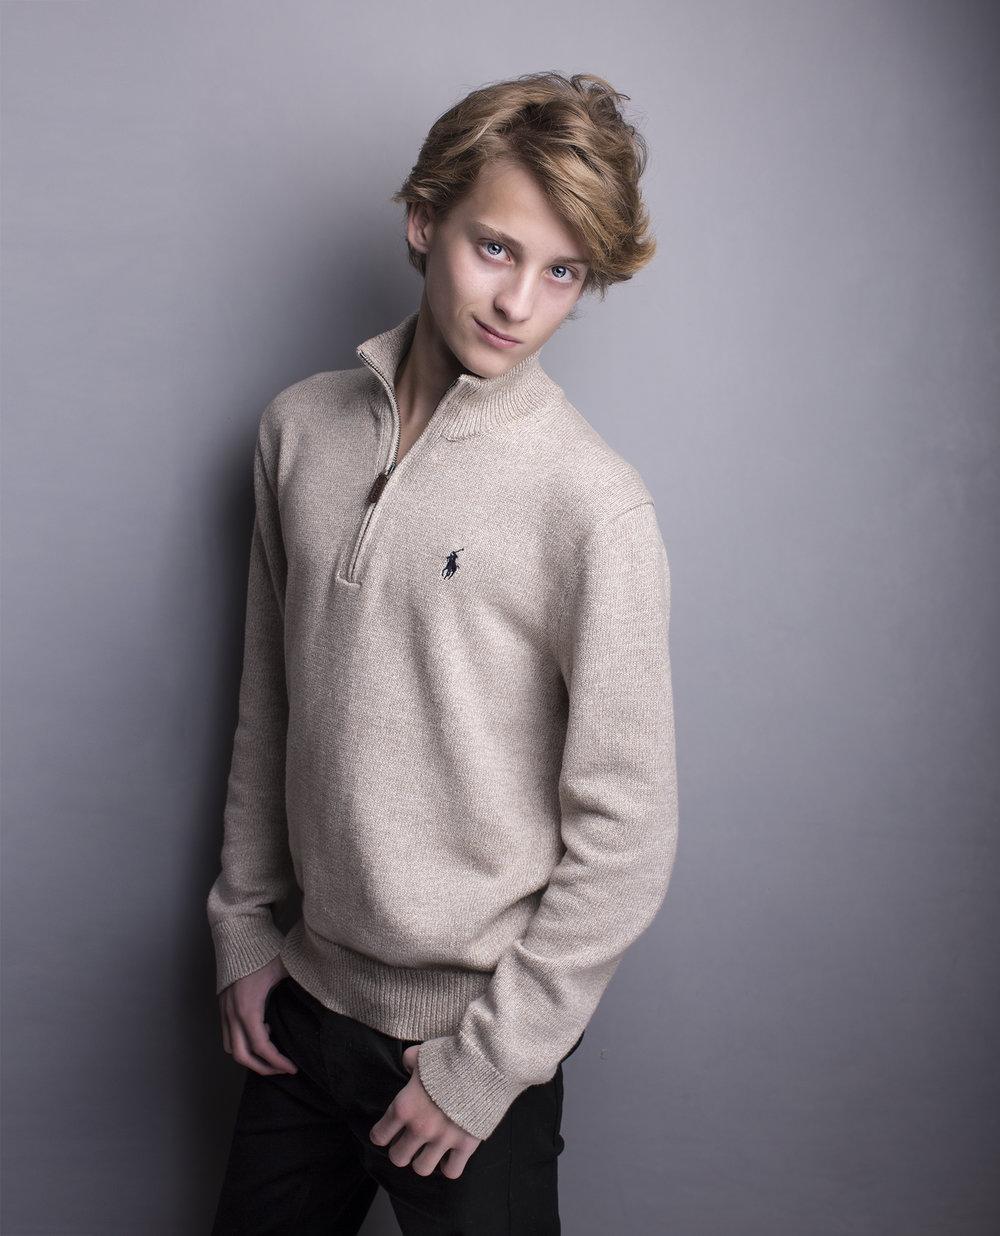 Elizabethg_fineart_photography_kingslangley_hertfordshire_kidslondon_model_familyportrait_male_fashion_maxmillion_3.jpg